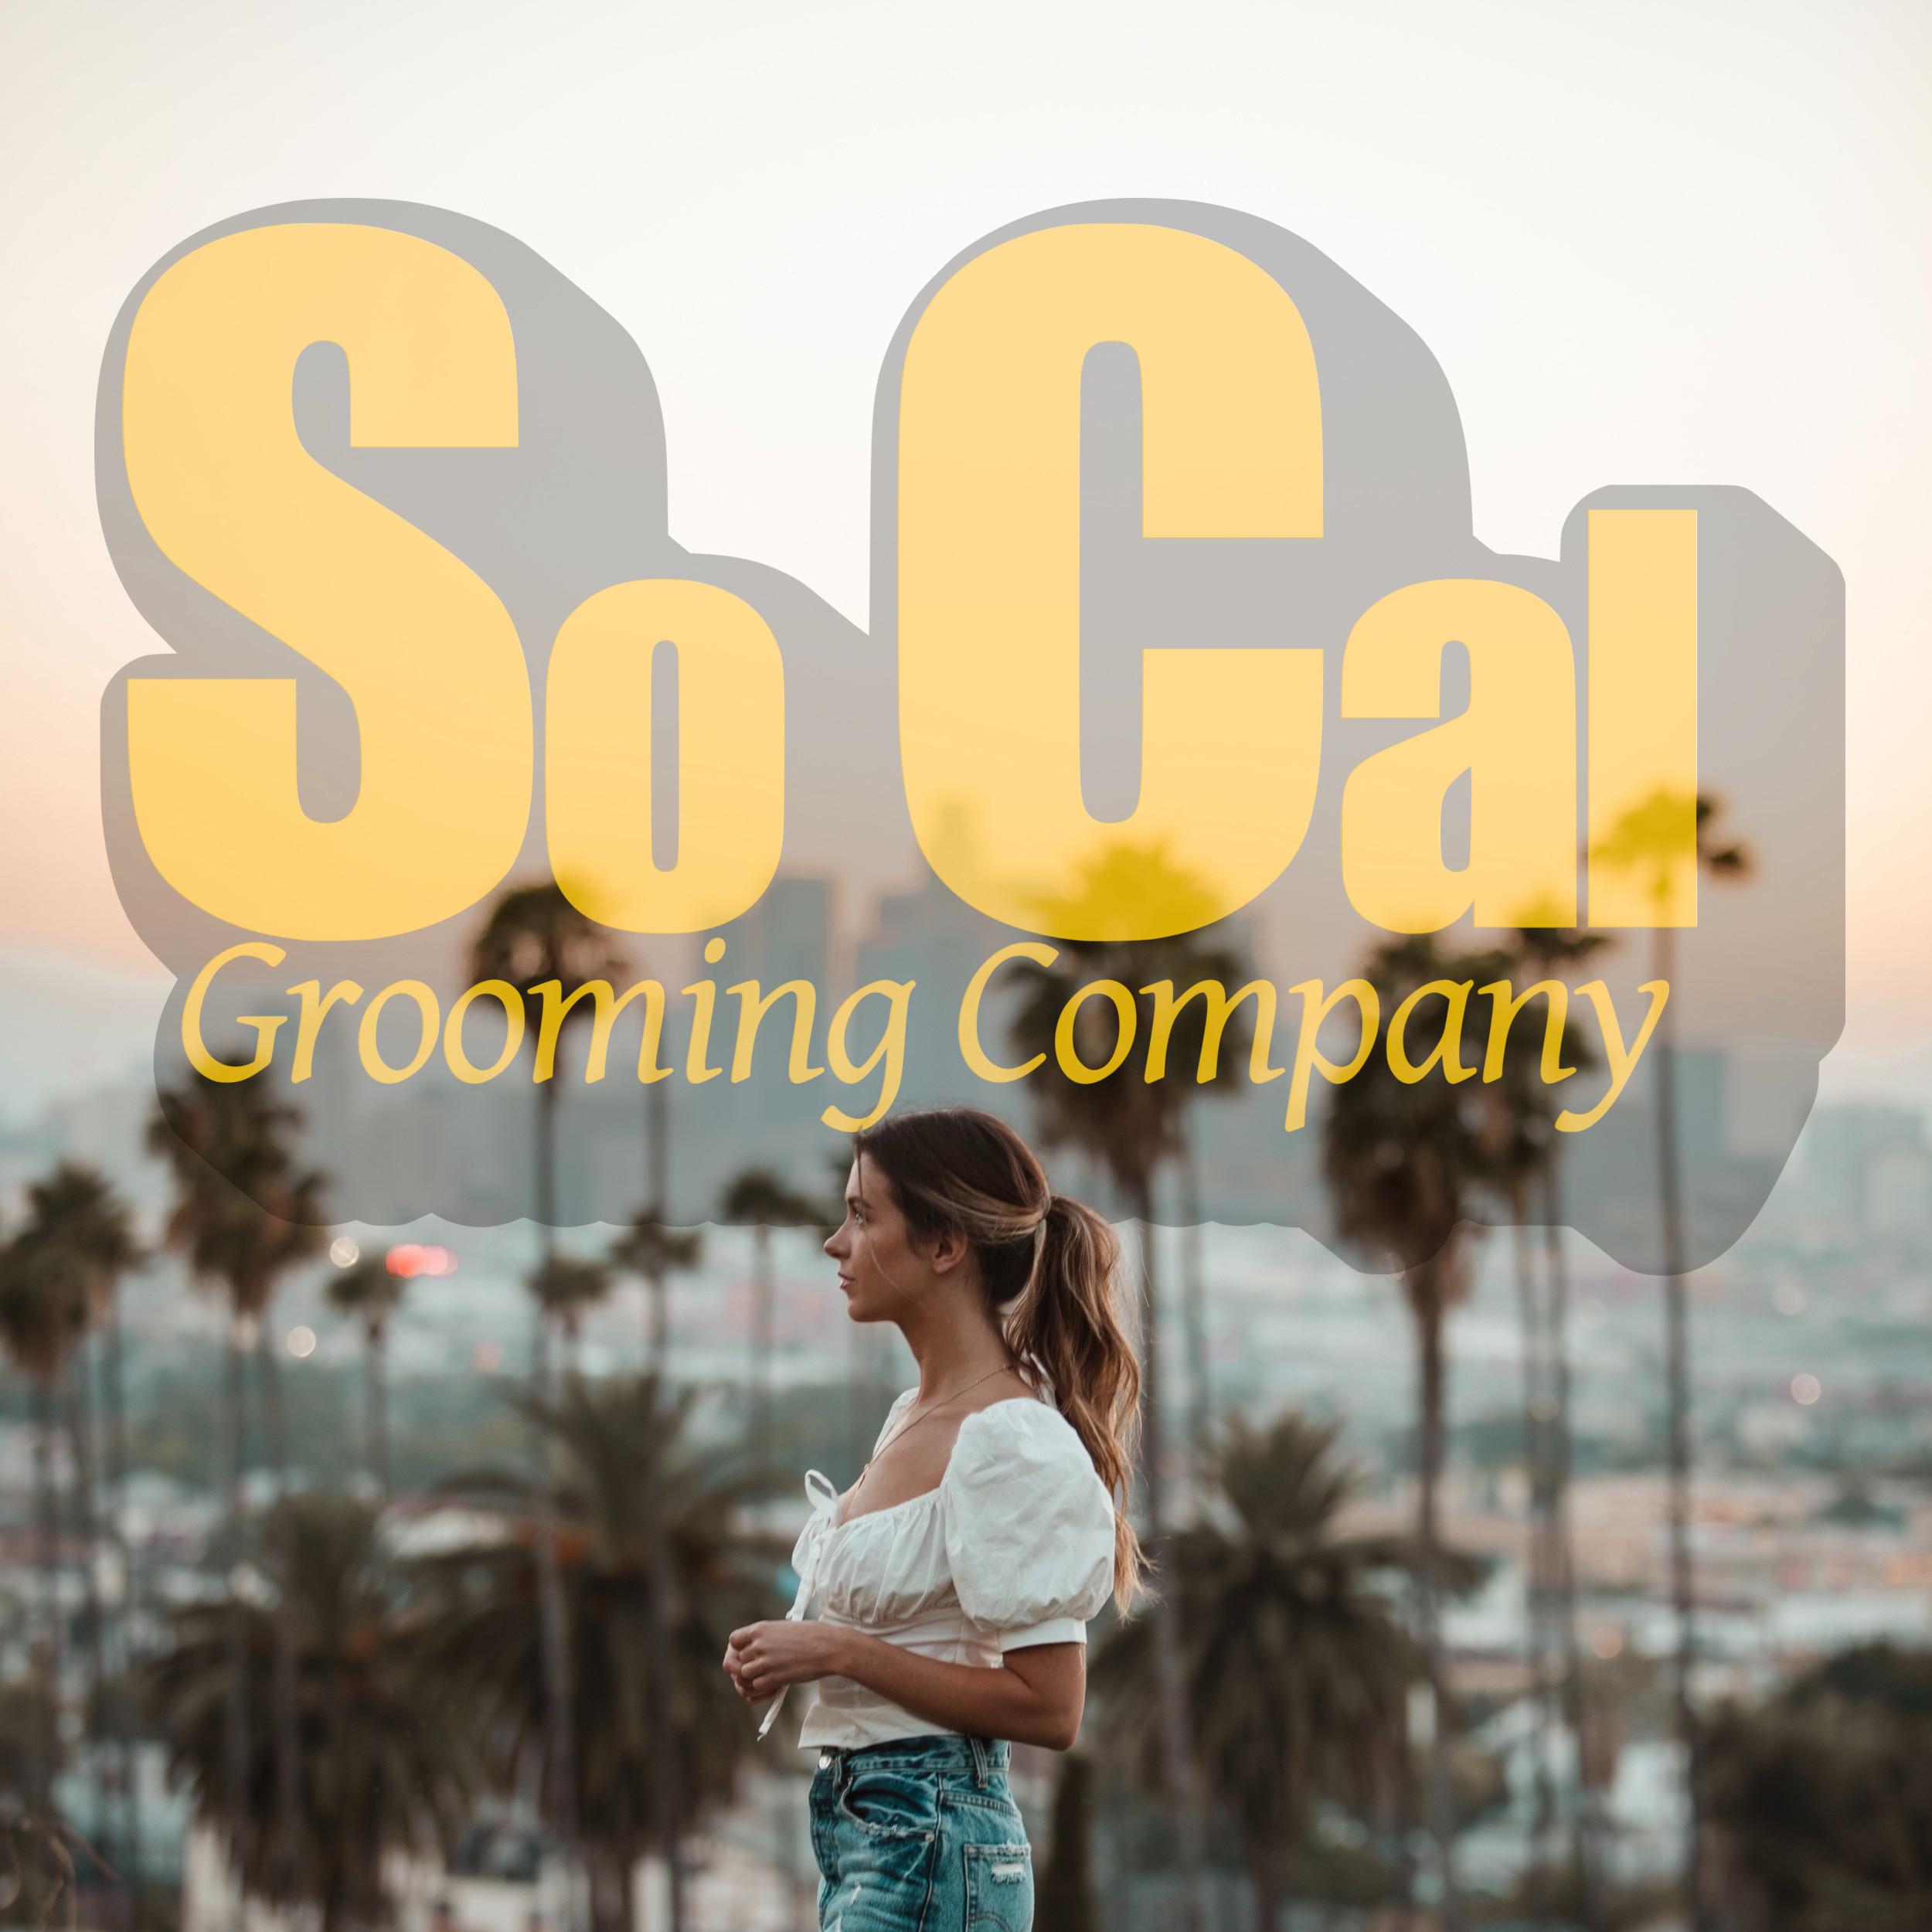 SoCal Grooming Company